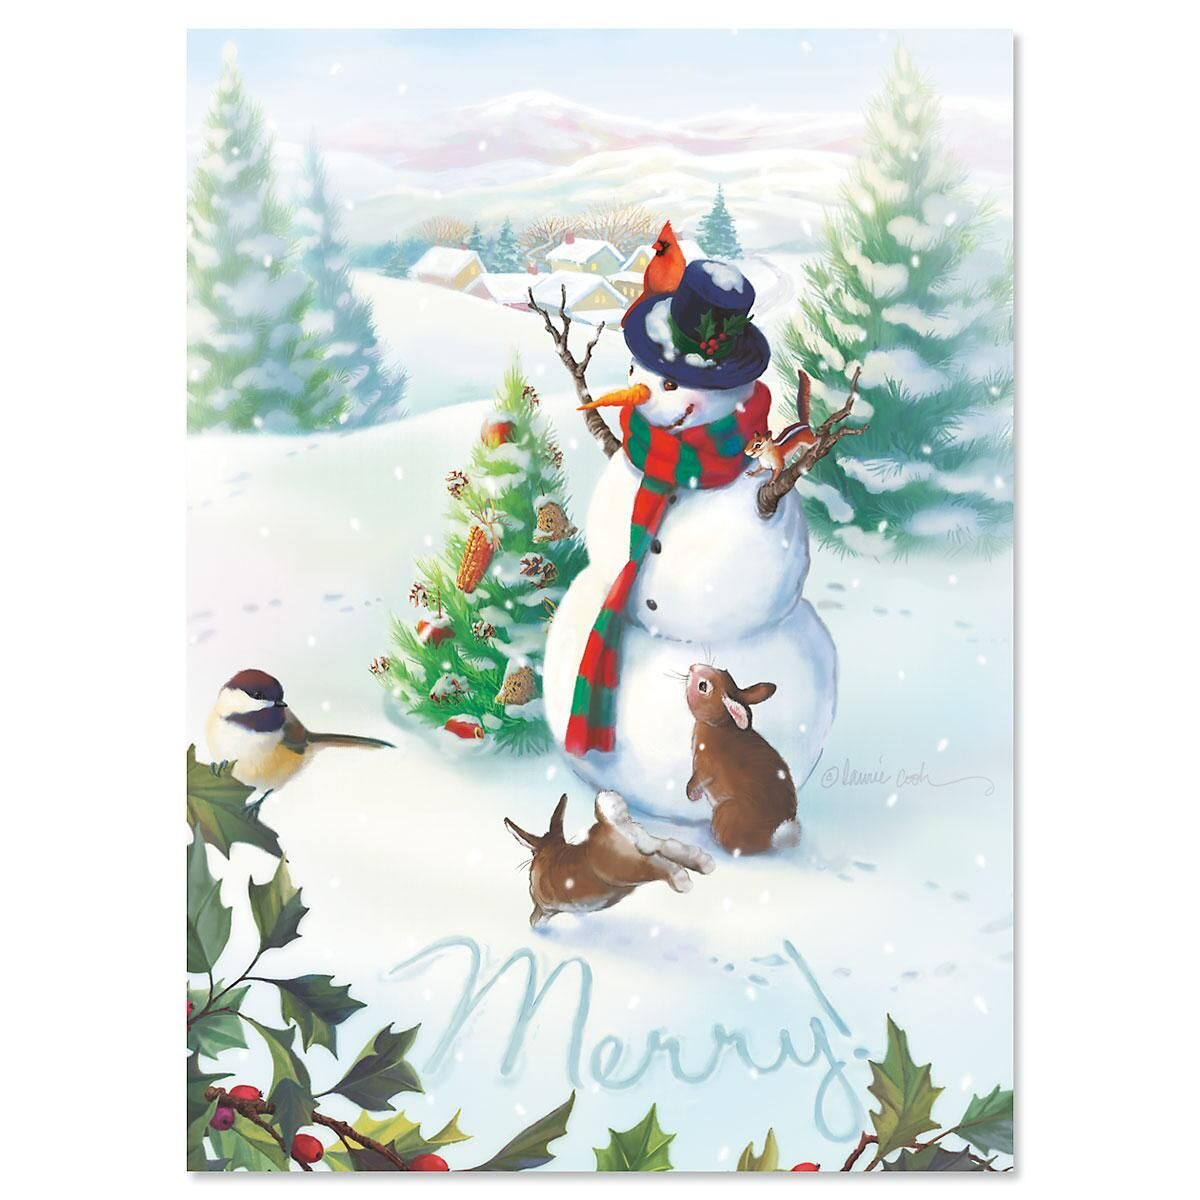 Merry Snowman Christmas Cards